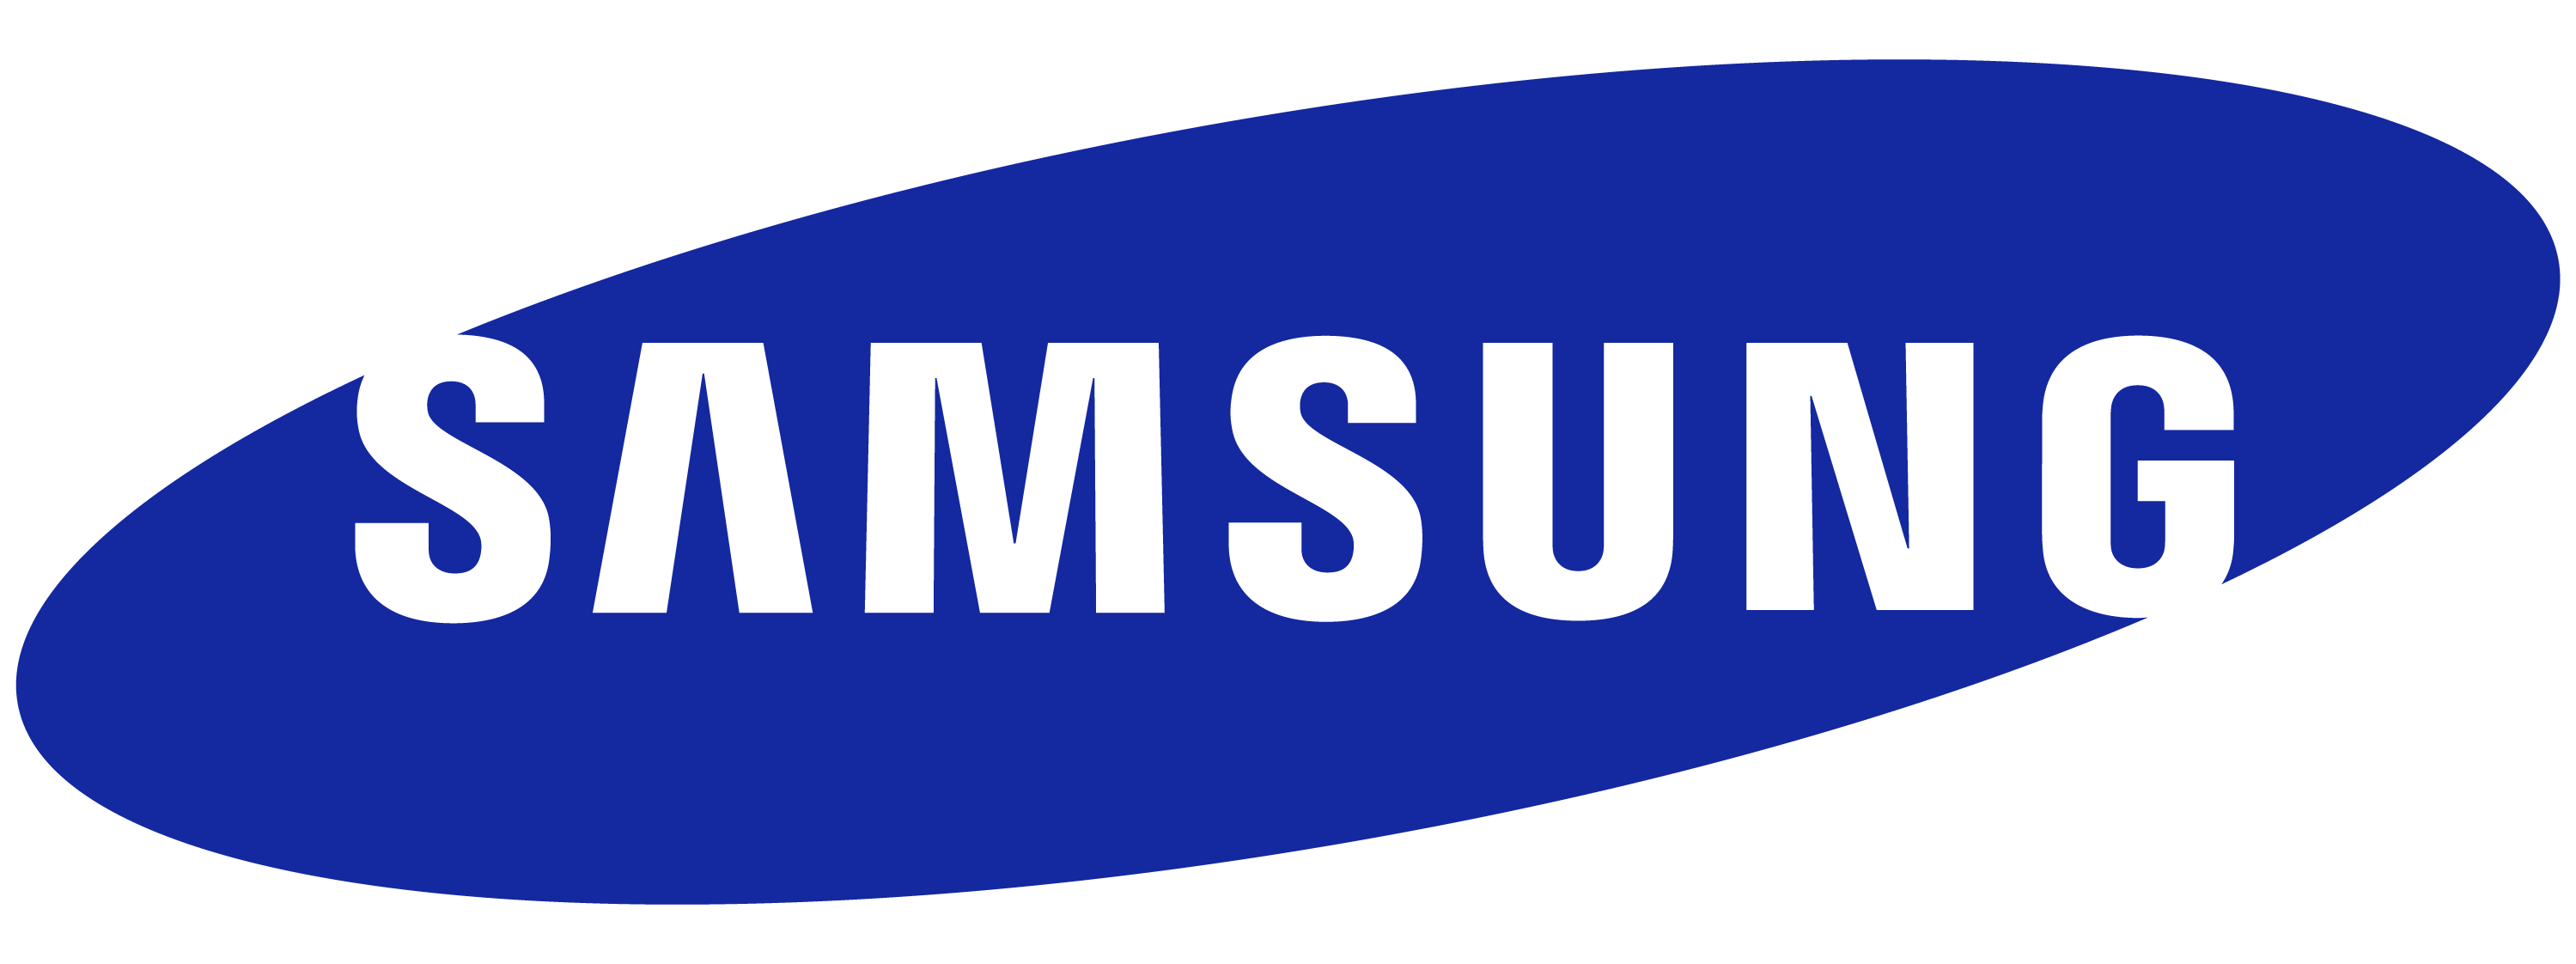 Samsung . Galaxy clipart sbc